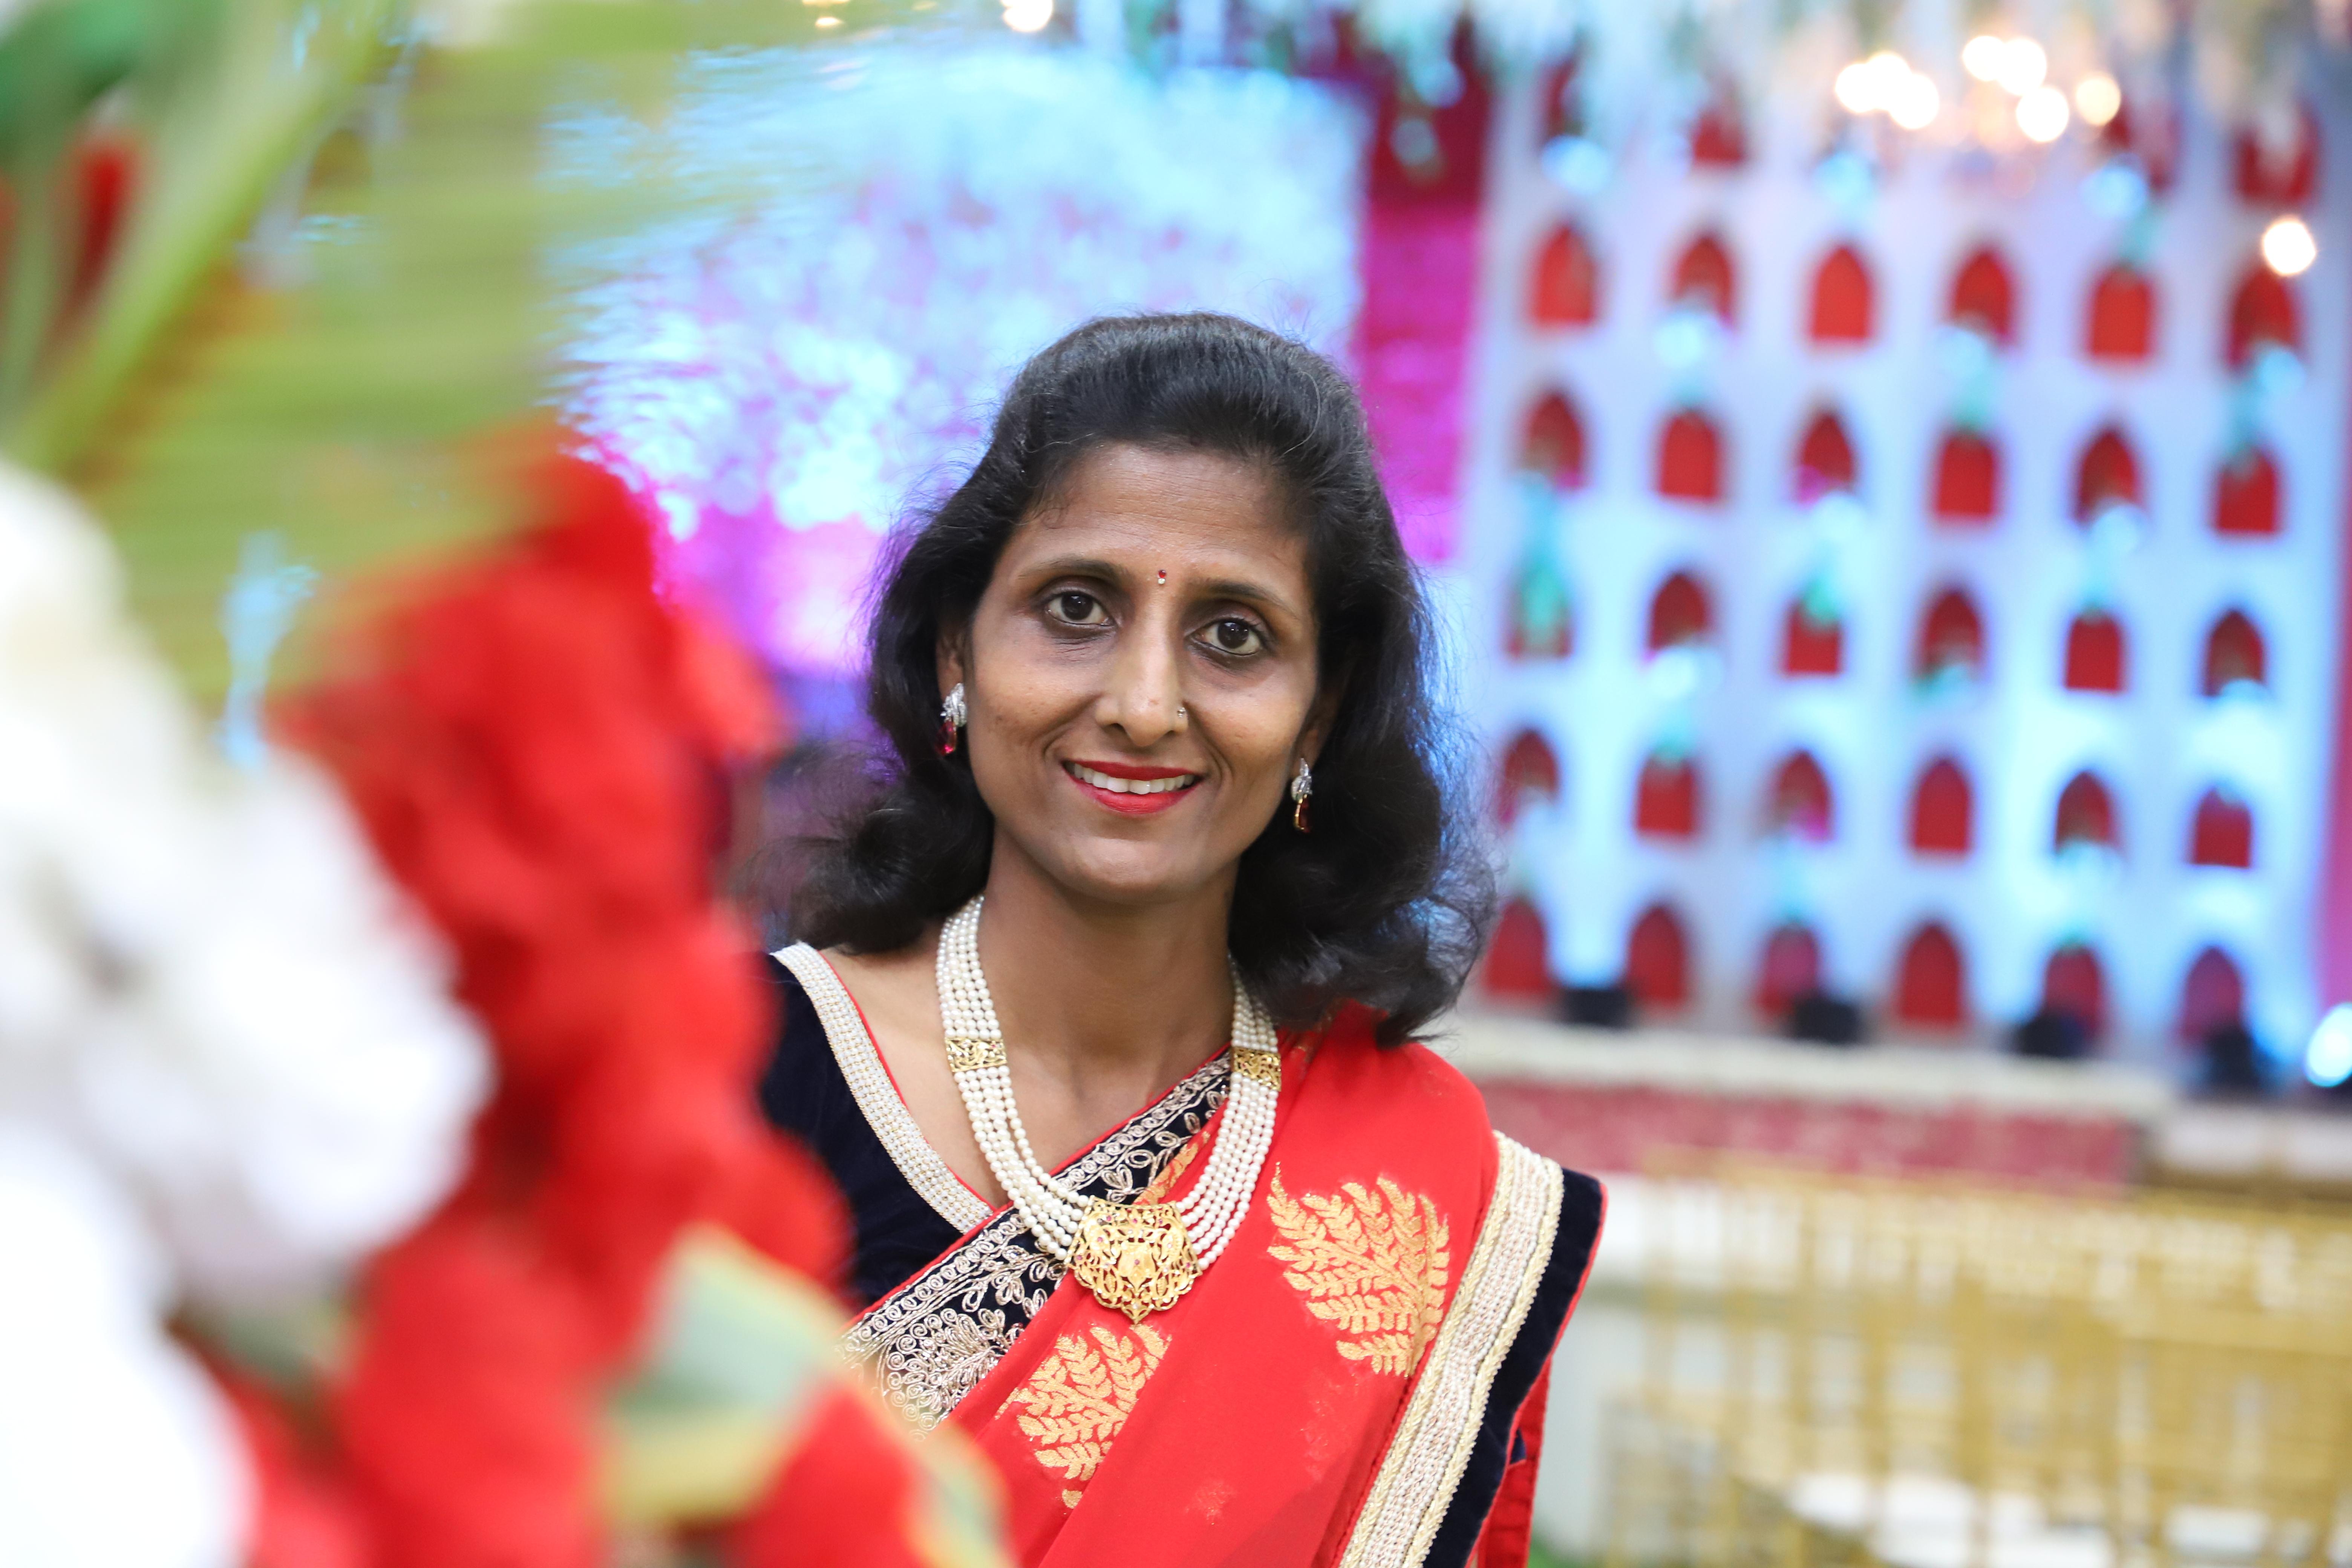 Nutritionist Shilpa Mittal